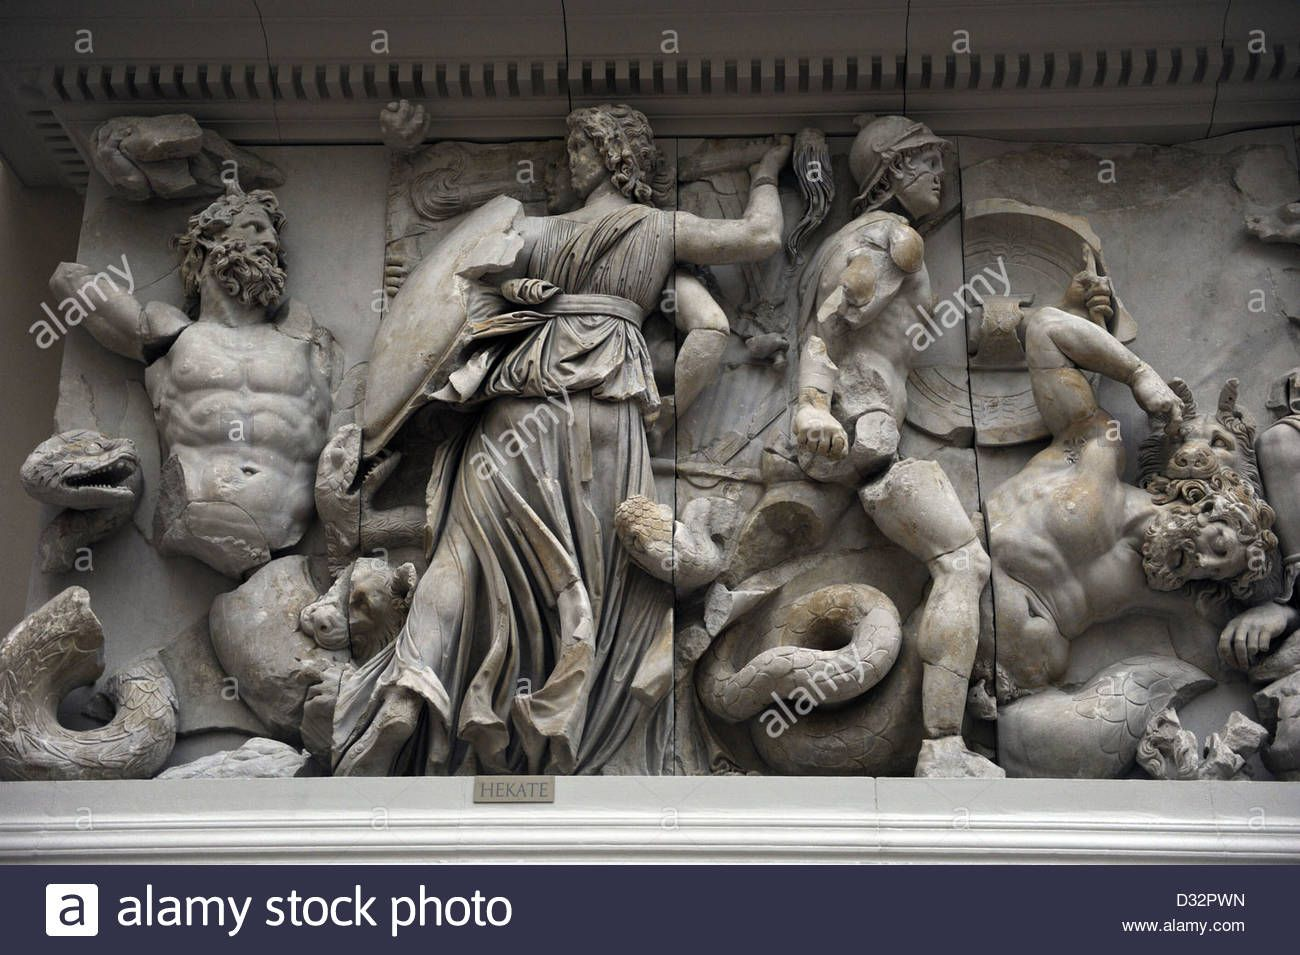 Pergamon Altar South Frieze The Three Faceted Goddess Hecate Fighting Against Klytios Pergamon Museum Berlin Pergamon Ancient Greek Art Pergamon Museum